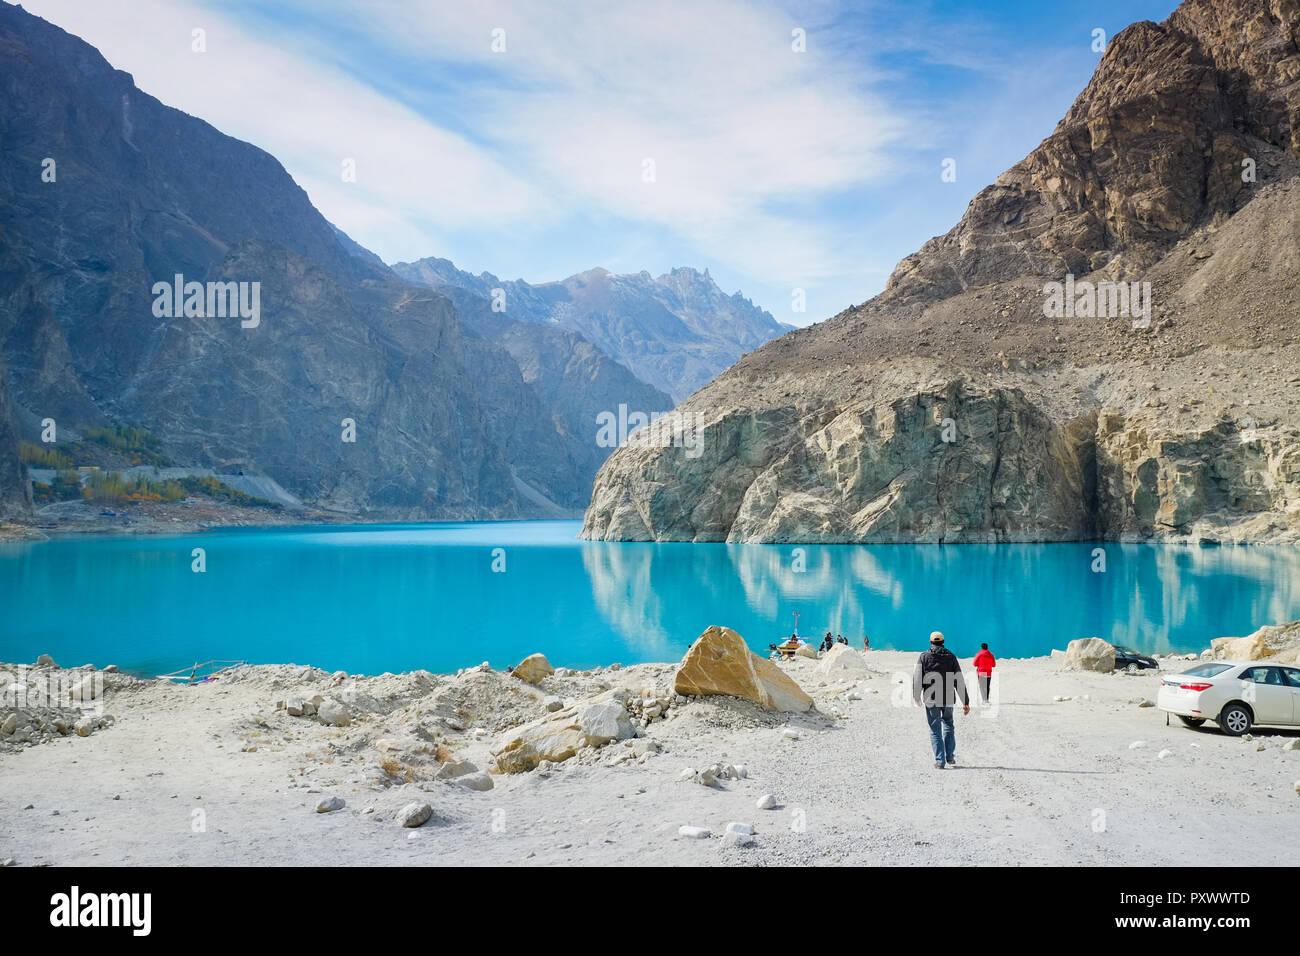 Men walking to ride a boat at the Attabad lake. Gojal, Hunza, Gilgit-Baltistan, Pakistan. - Stock Image